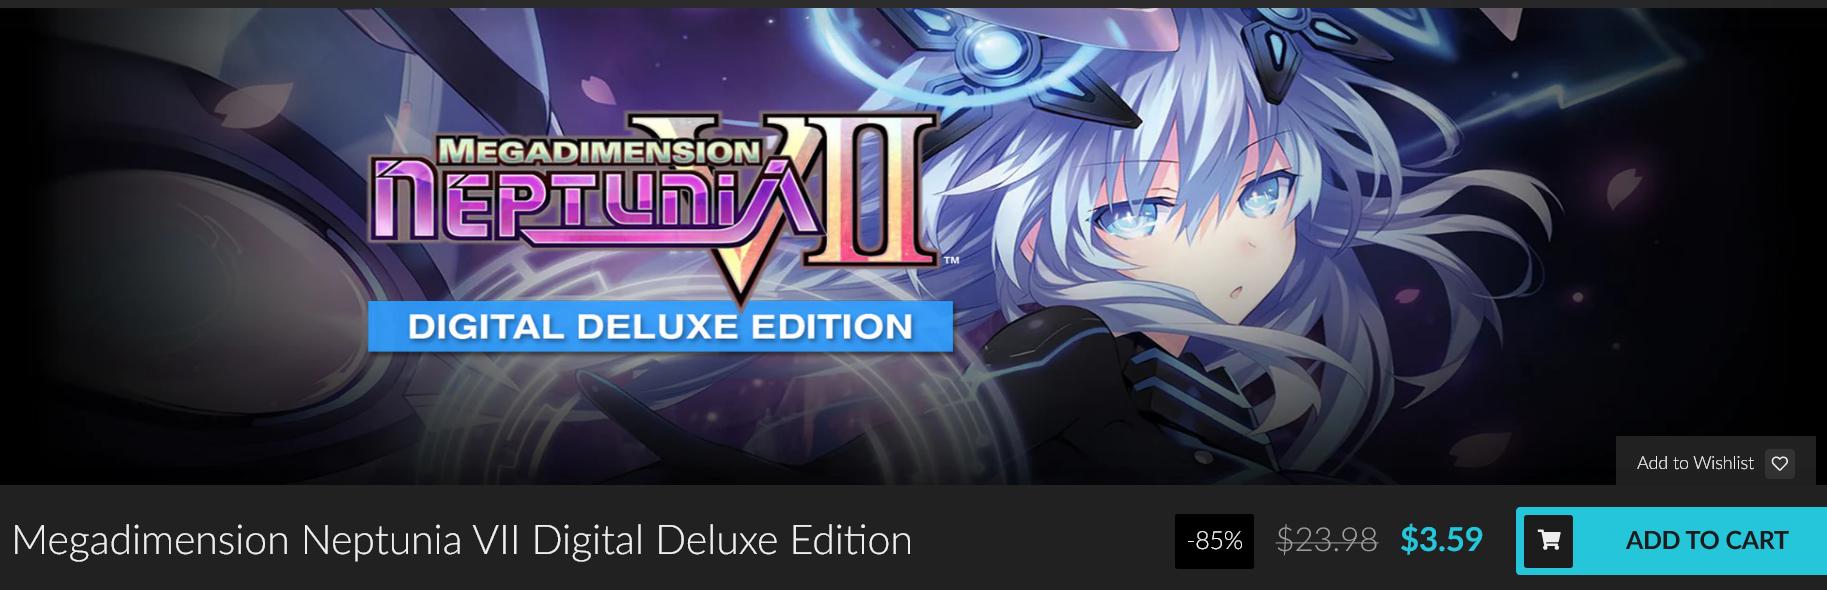 Screenshot_2020-01-08 Megadimension Neptunia VII Digital Deluxe Edition PC Steam Fanatical.png